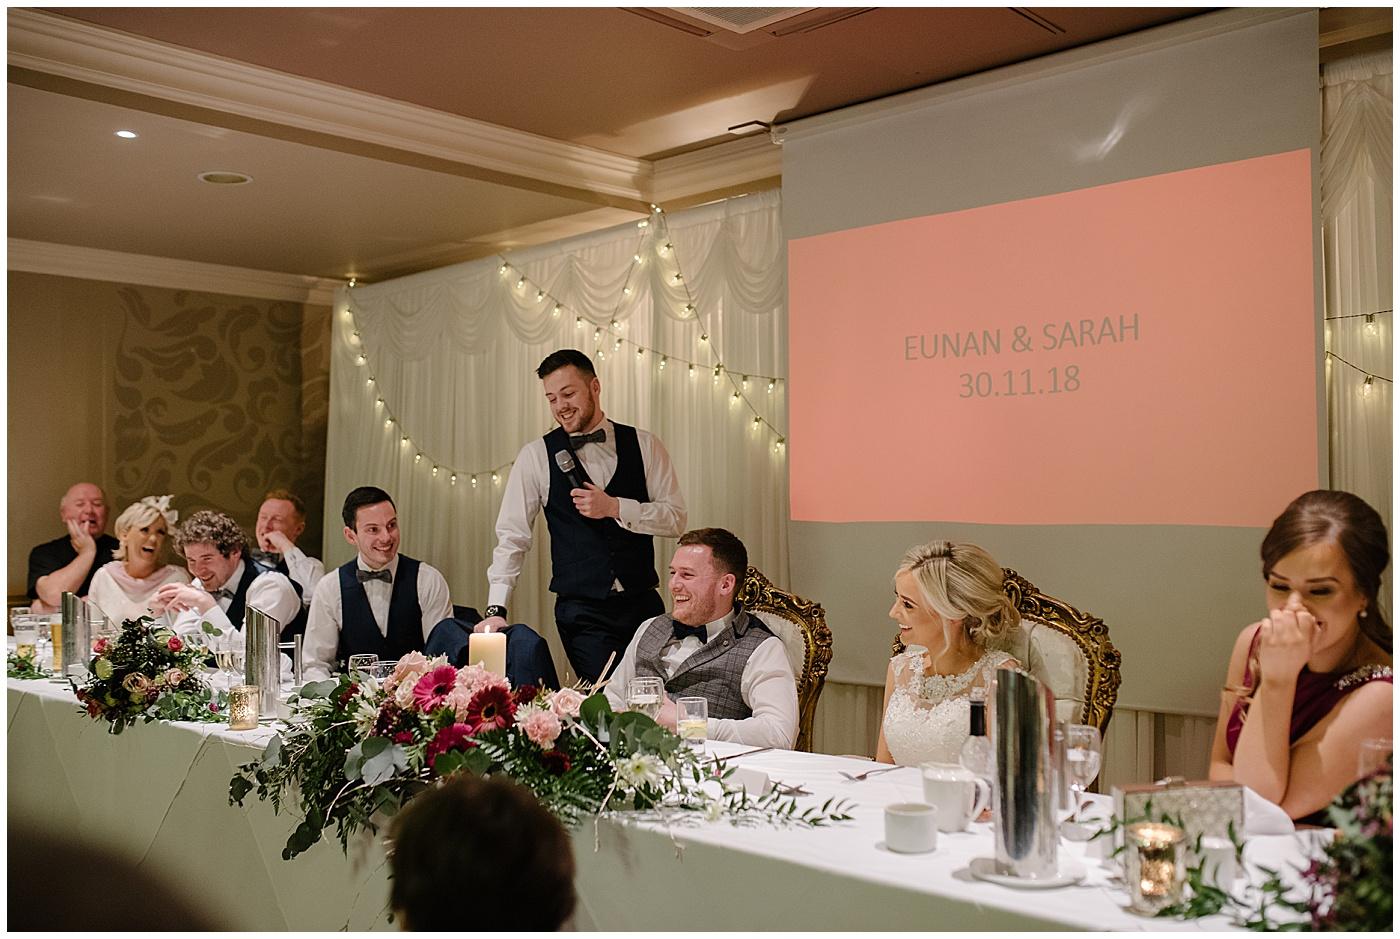 lissan-house-wedding-jude-browne-photography_0121.jpg